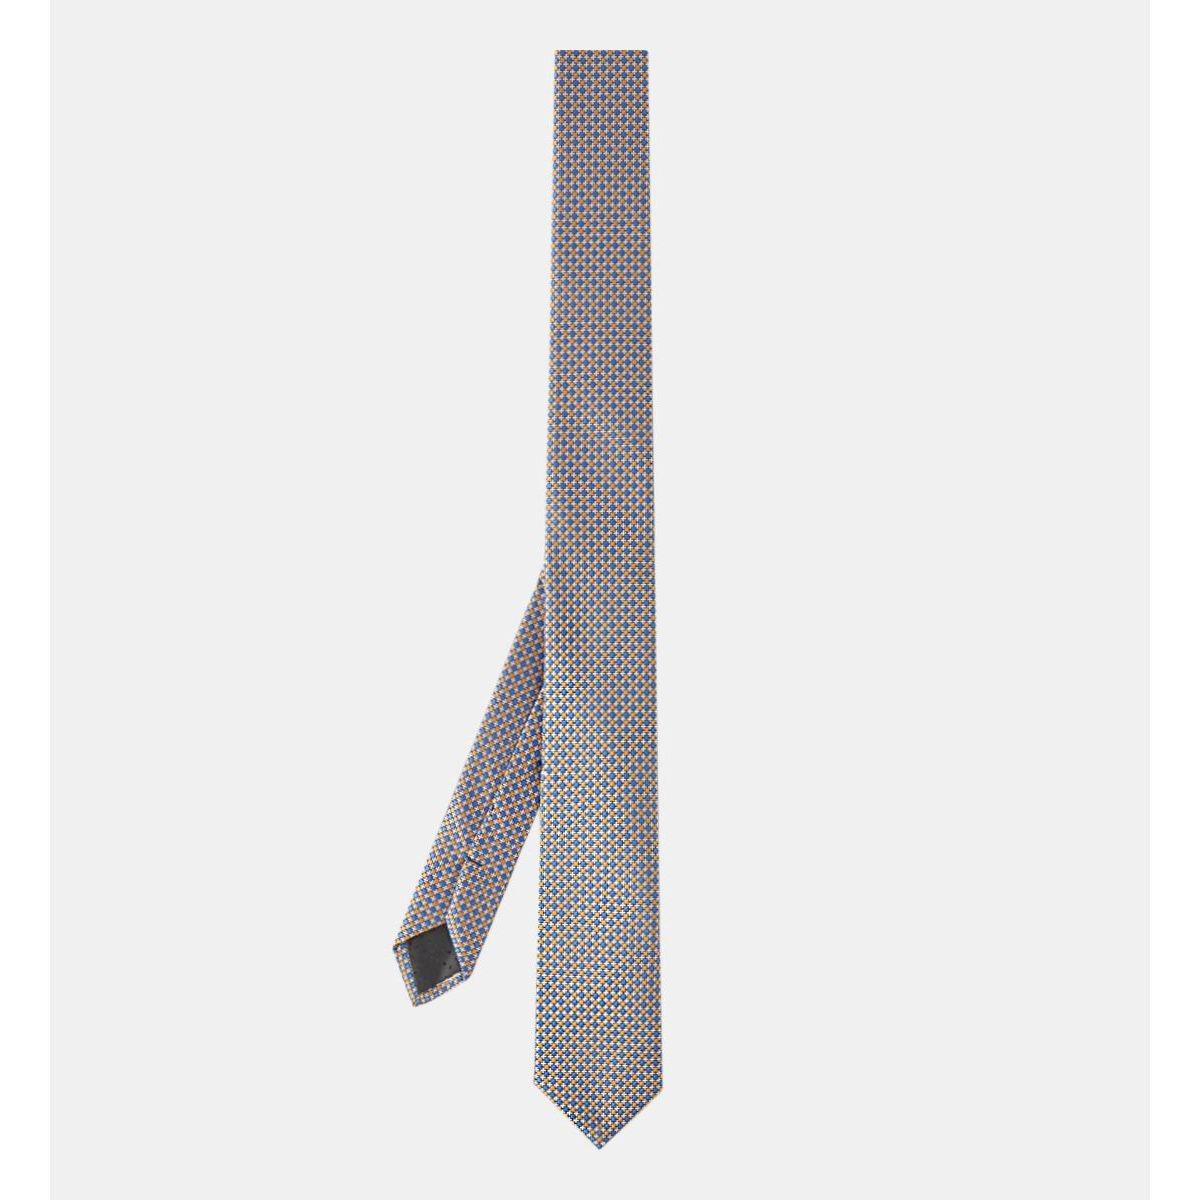 Cravate Large Fidamier